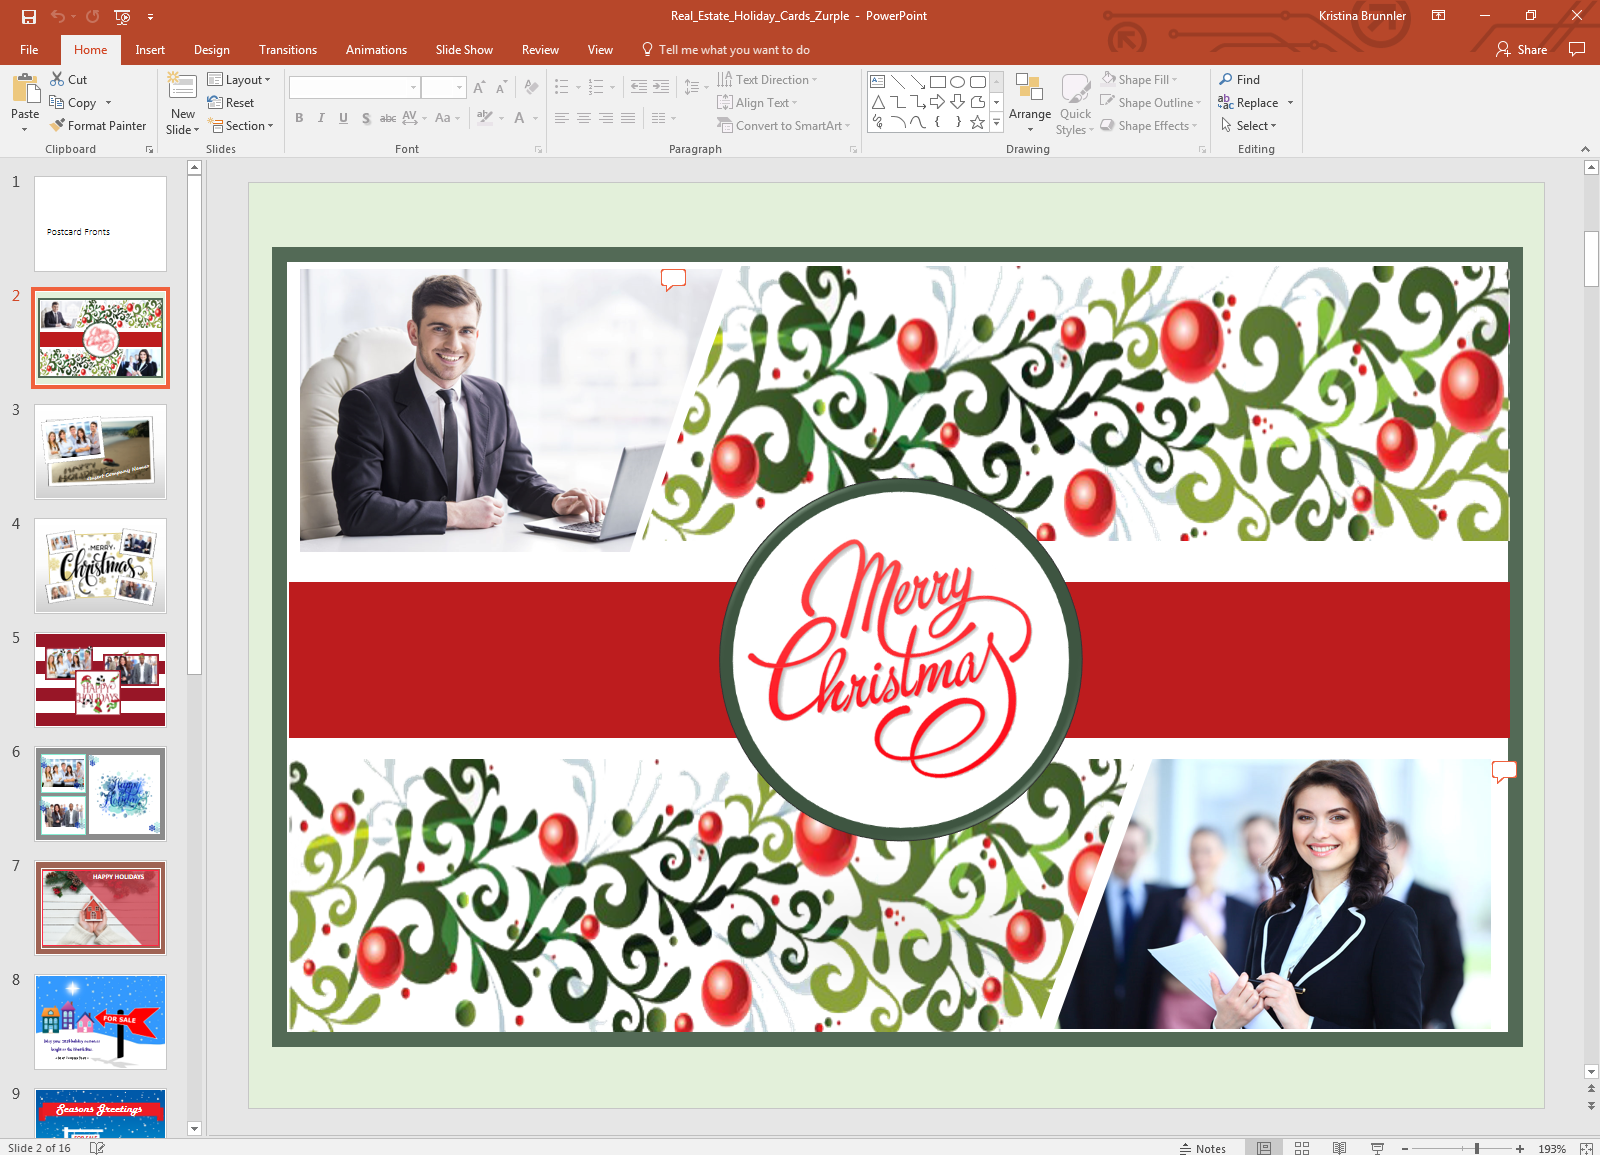 Real_Estate_Holiday_Cards_Screenshot-2.png